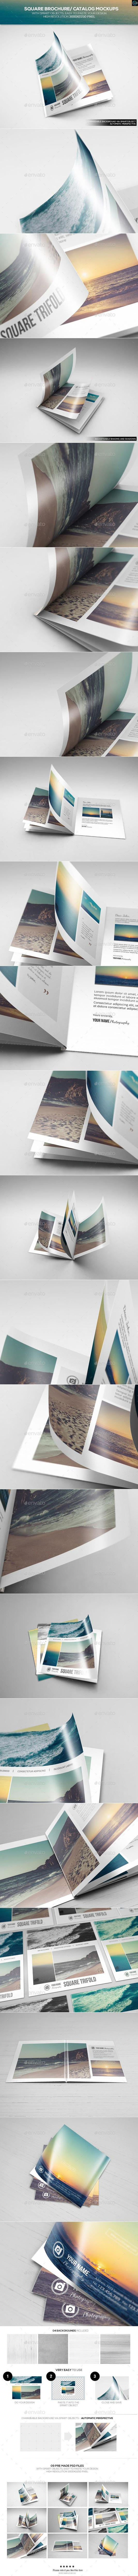 Square Brochure/ Catalog Mockups - Brochures Print